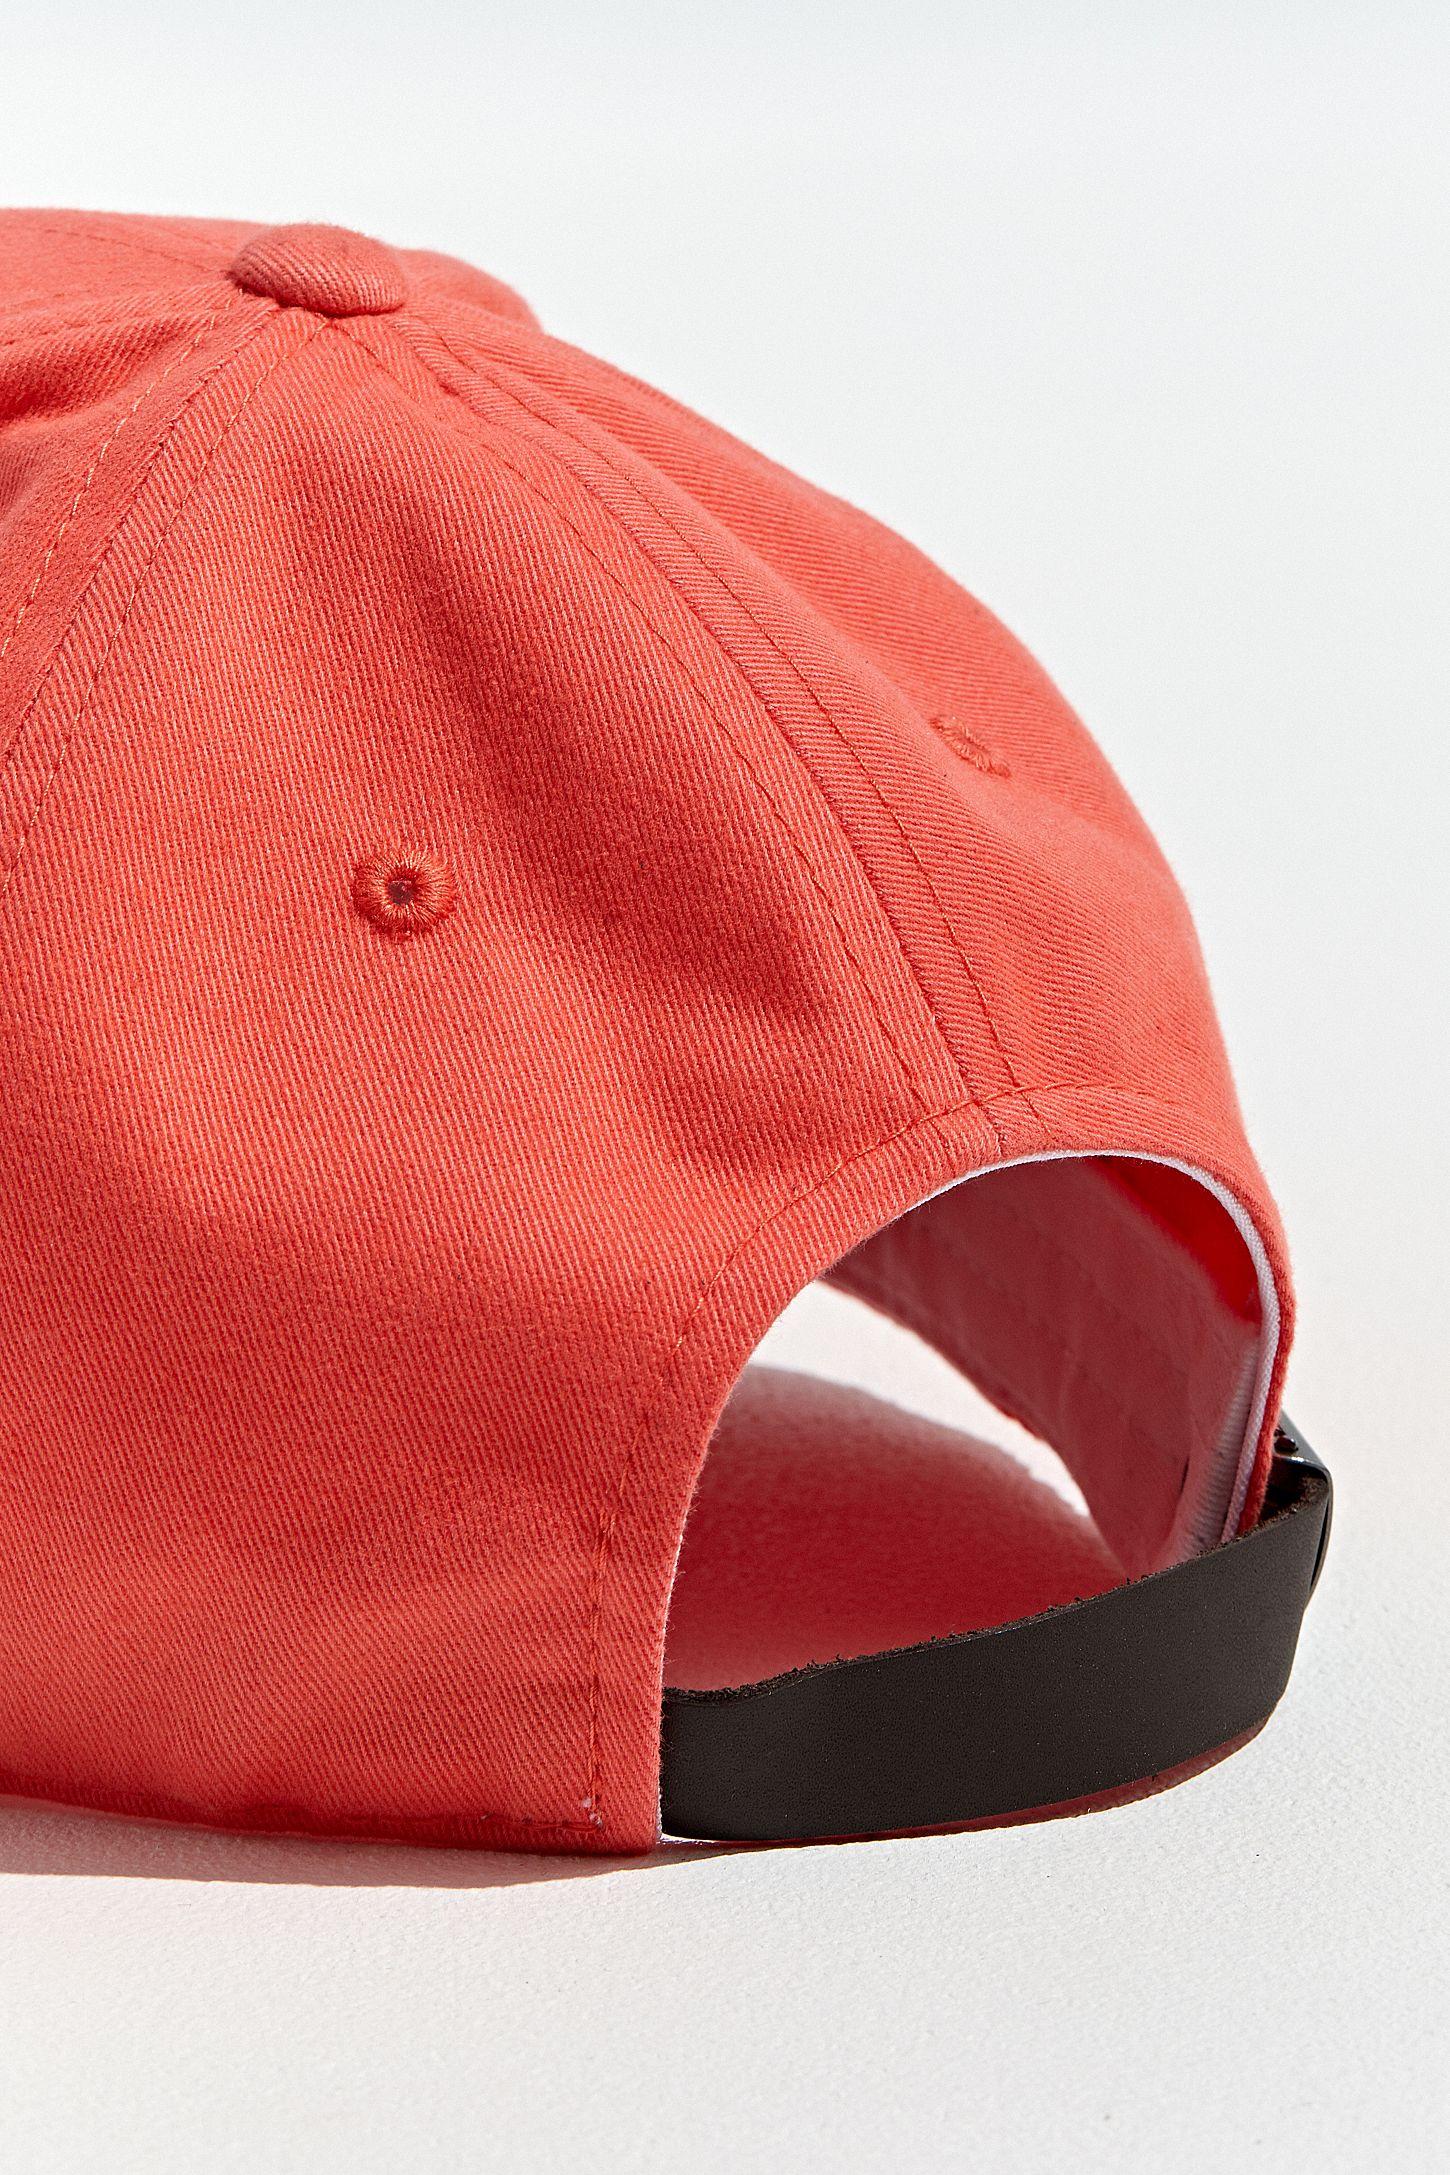 81f5443e97b Slide View  5  Champion Classic Twill Baseball Hat